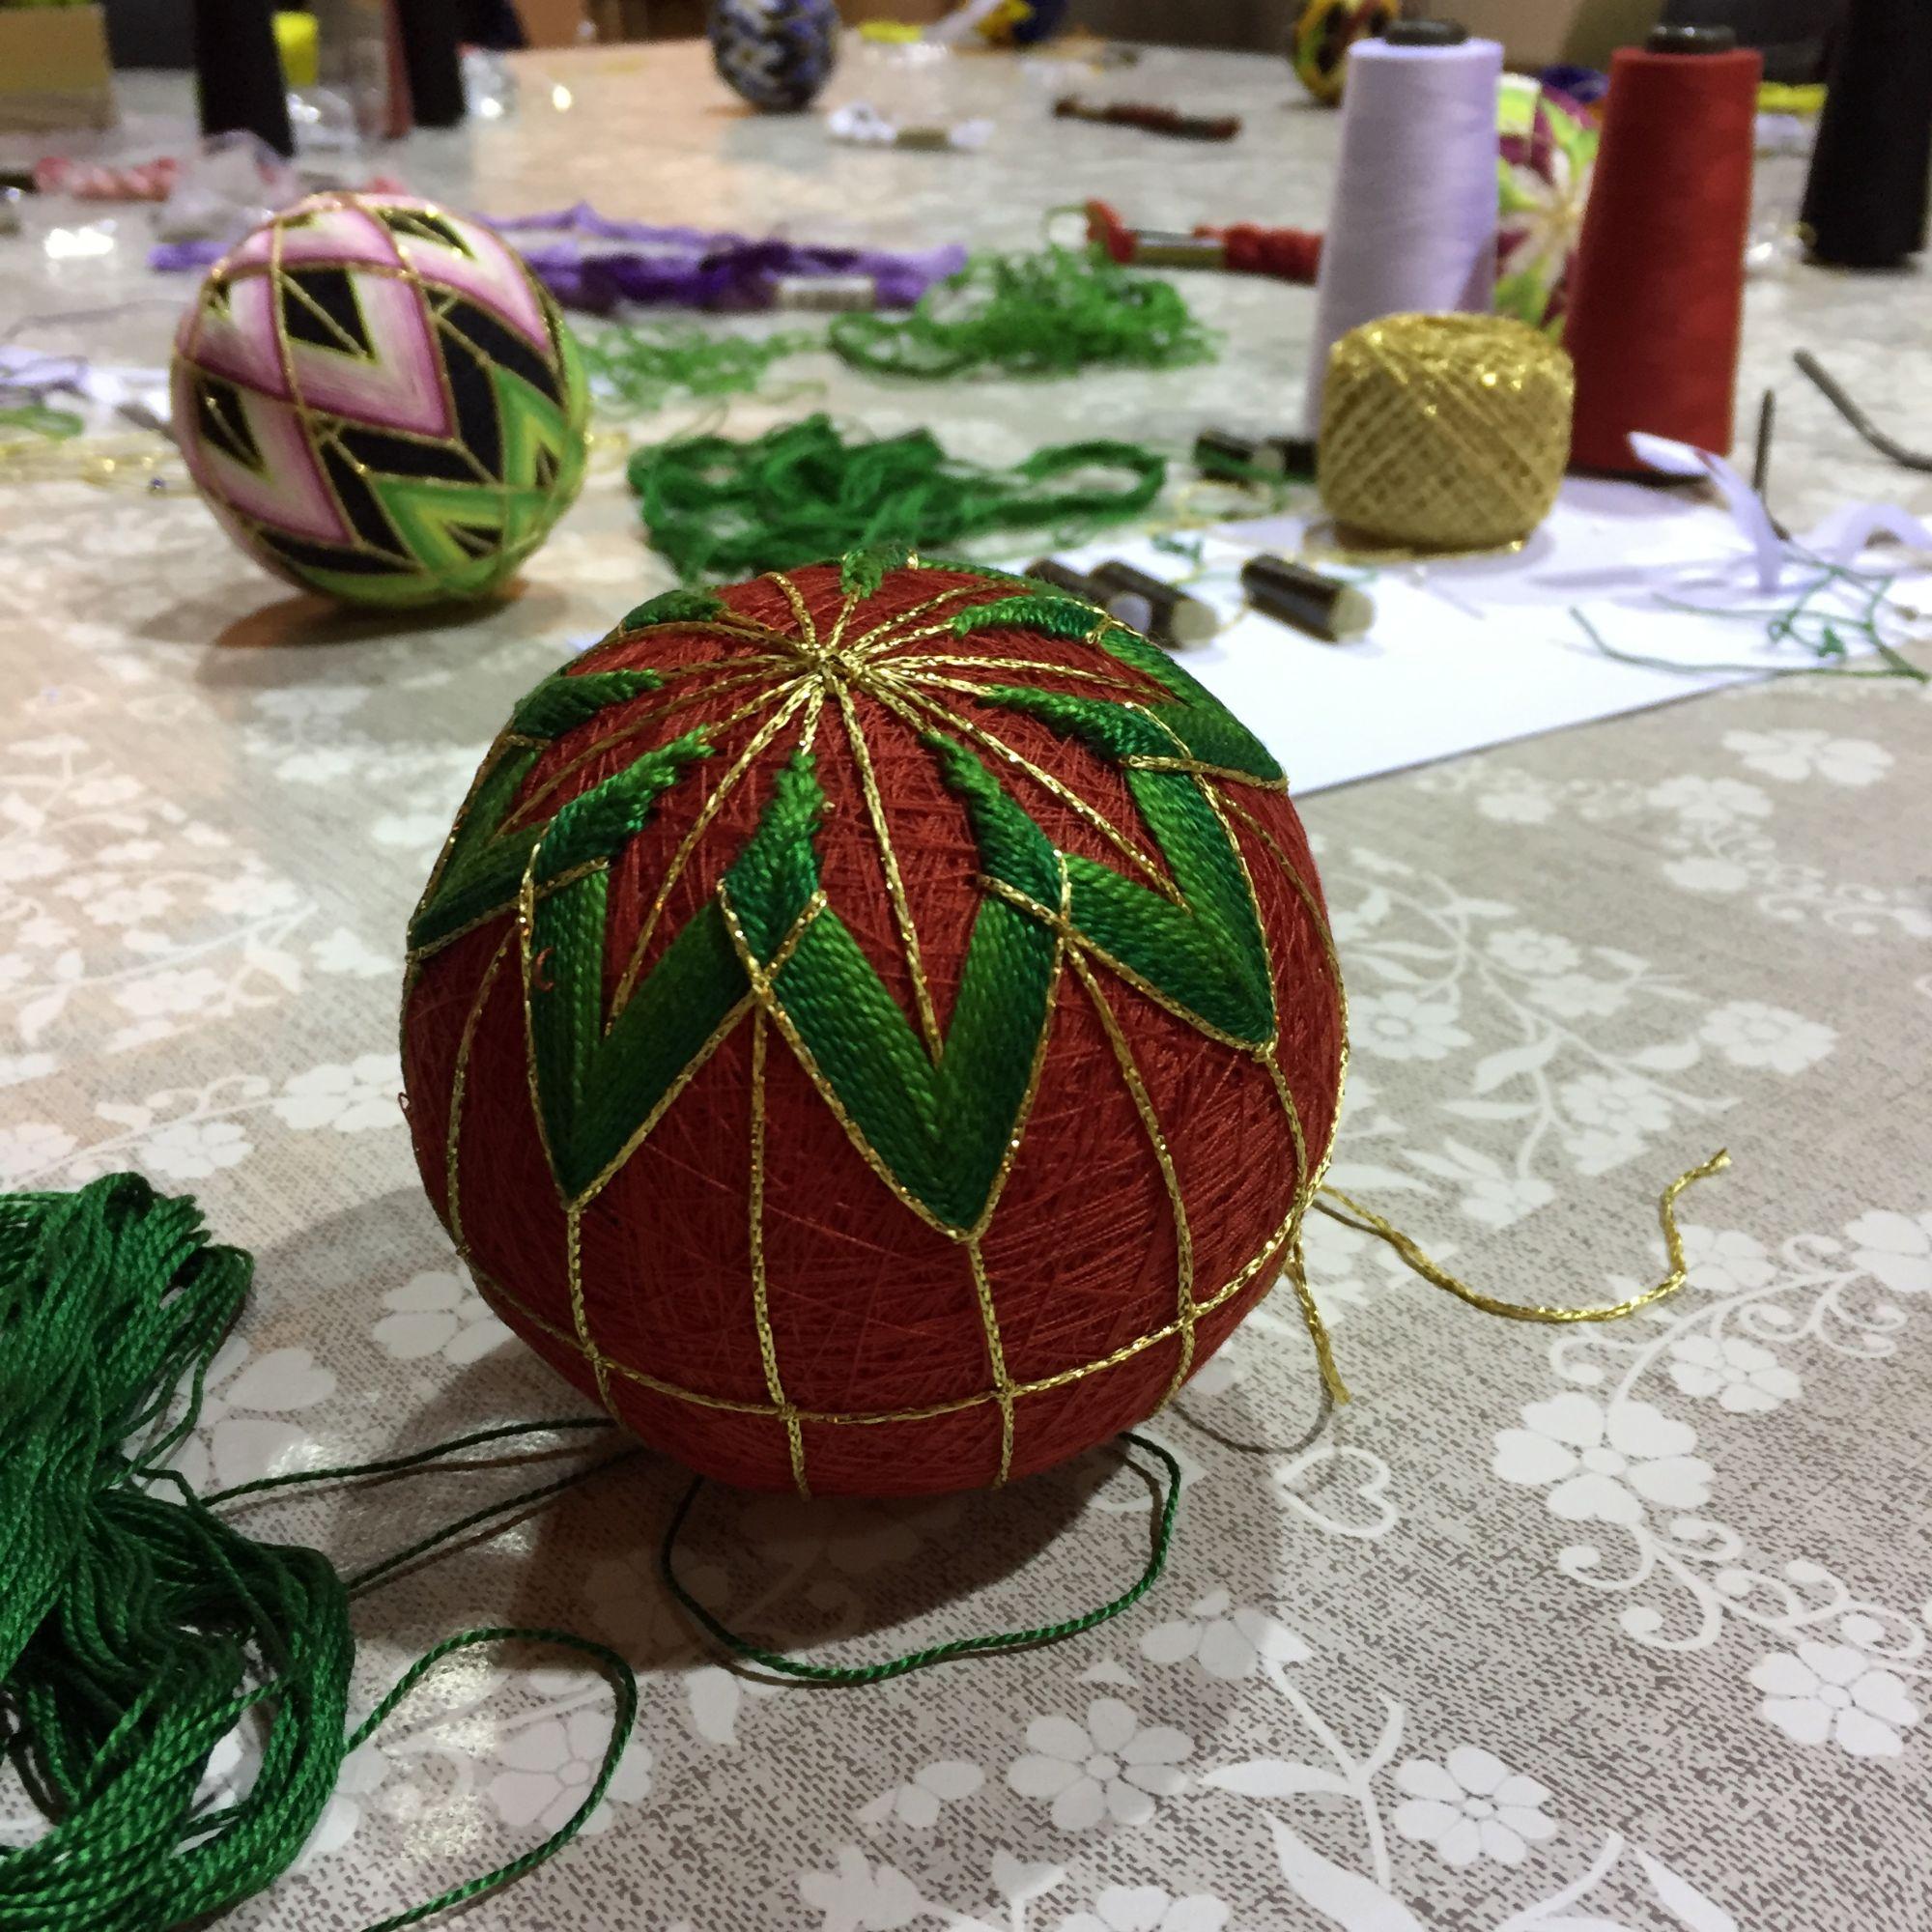 Temari Ball Making Workshop - Christmas Decorations